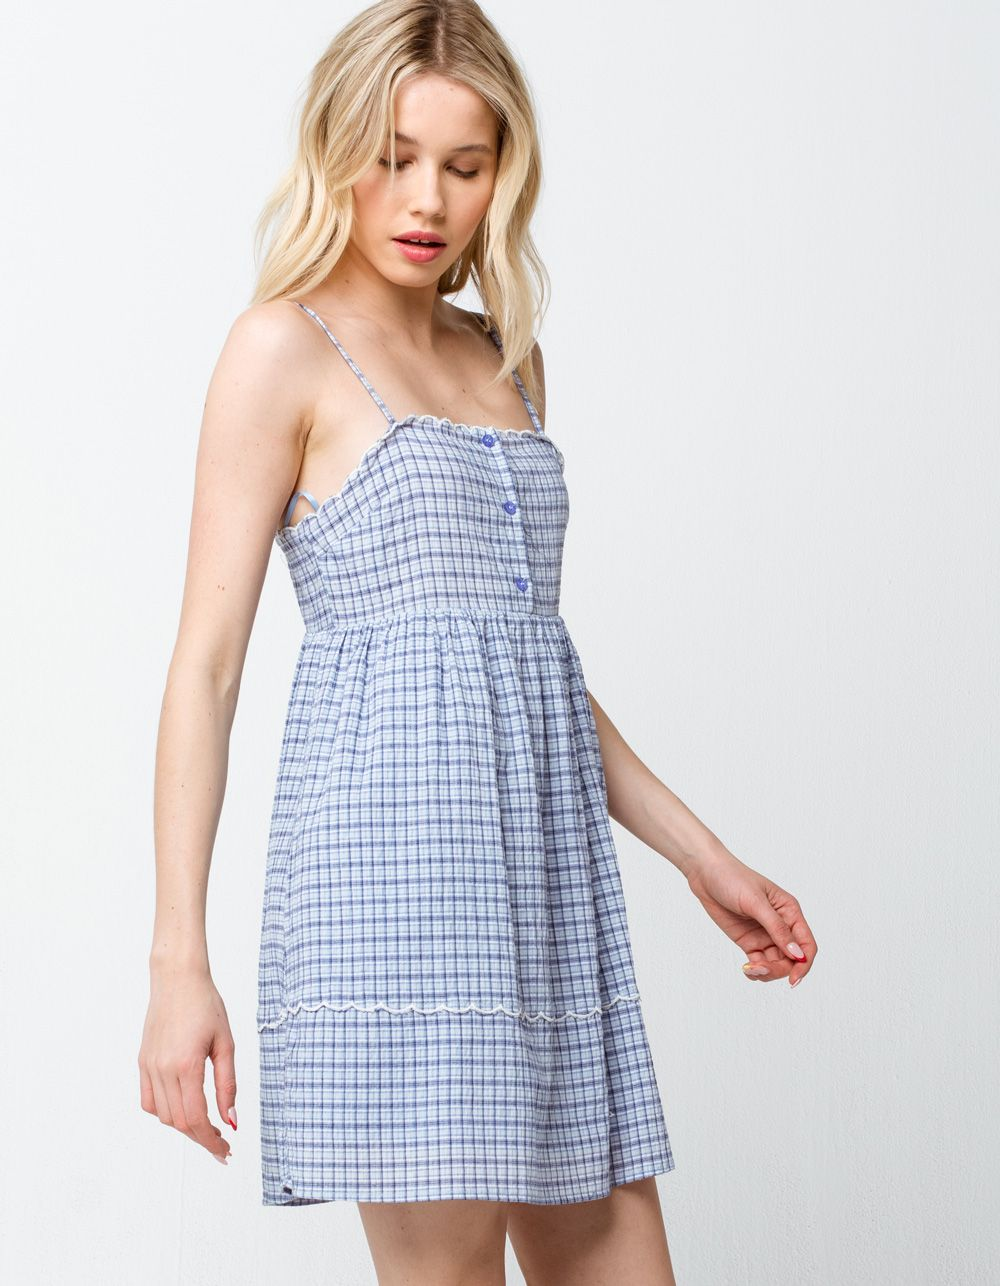 Very J Plaid Scallop Blue Babydoll Dress Blue 377372200 Casual Dresses For Women Plus Size Long Dresses Casual Dresses [ 1286 x 1000 Pixel ]